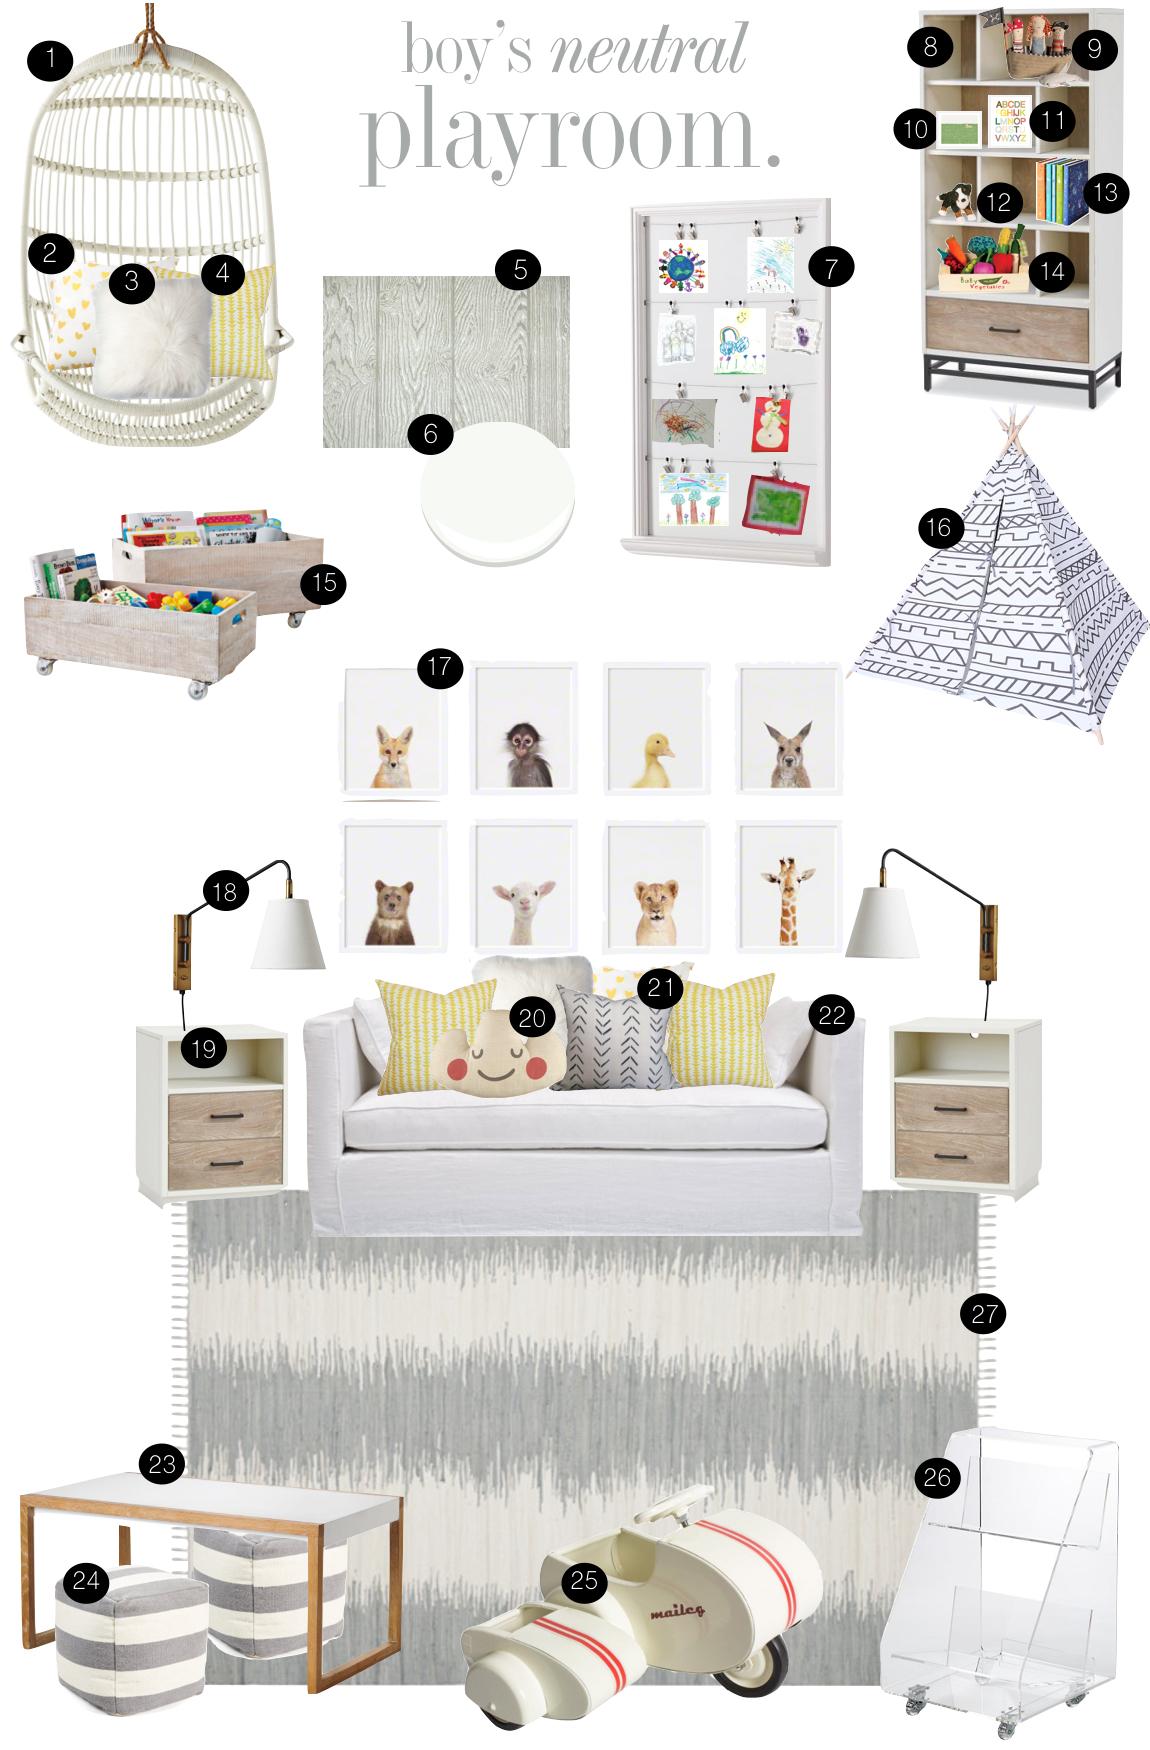 Boy's Neutral Playroom  |  Kiki's List